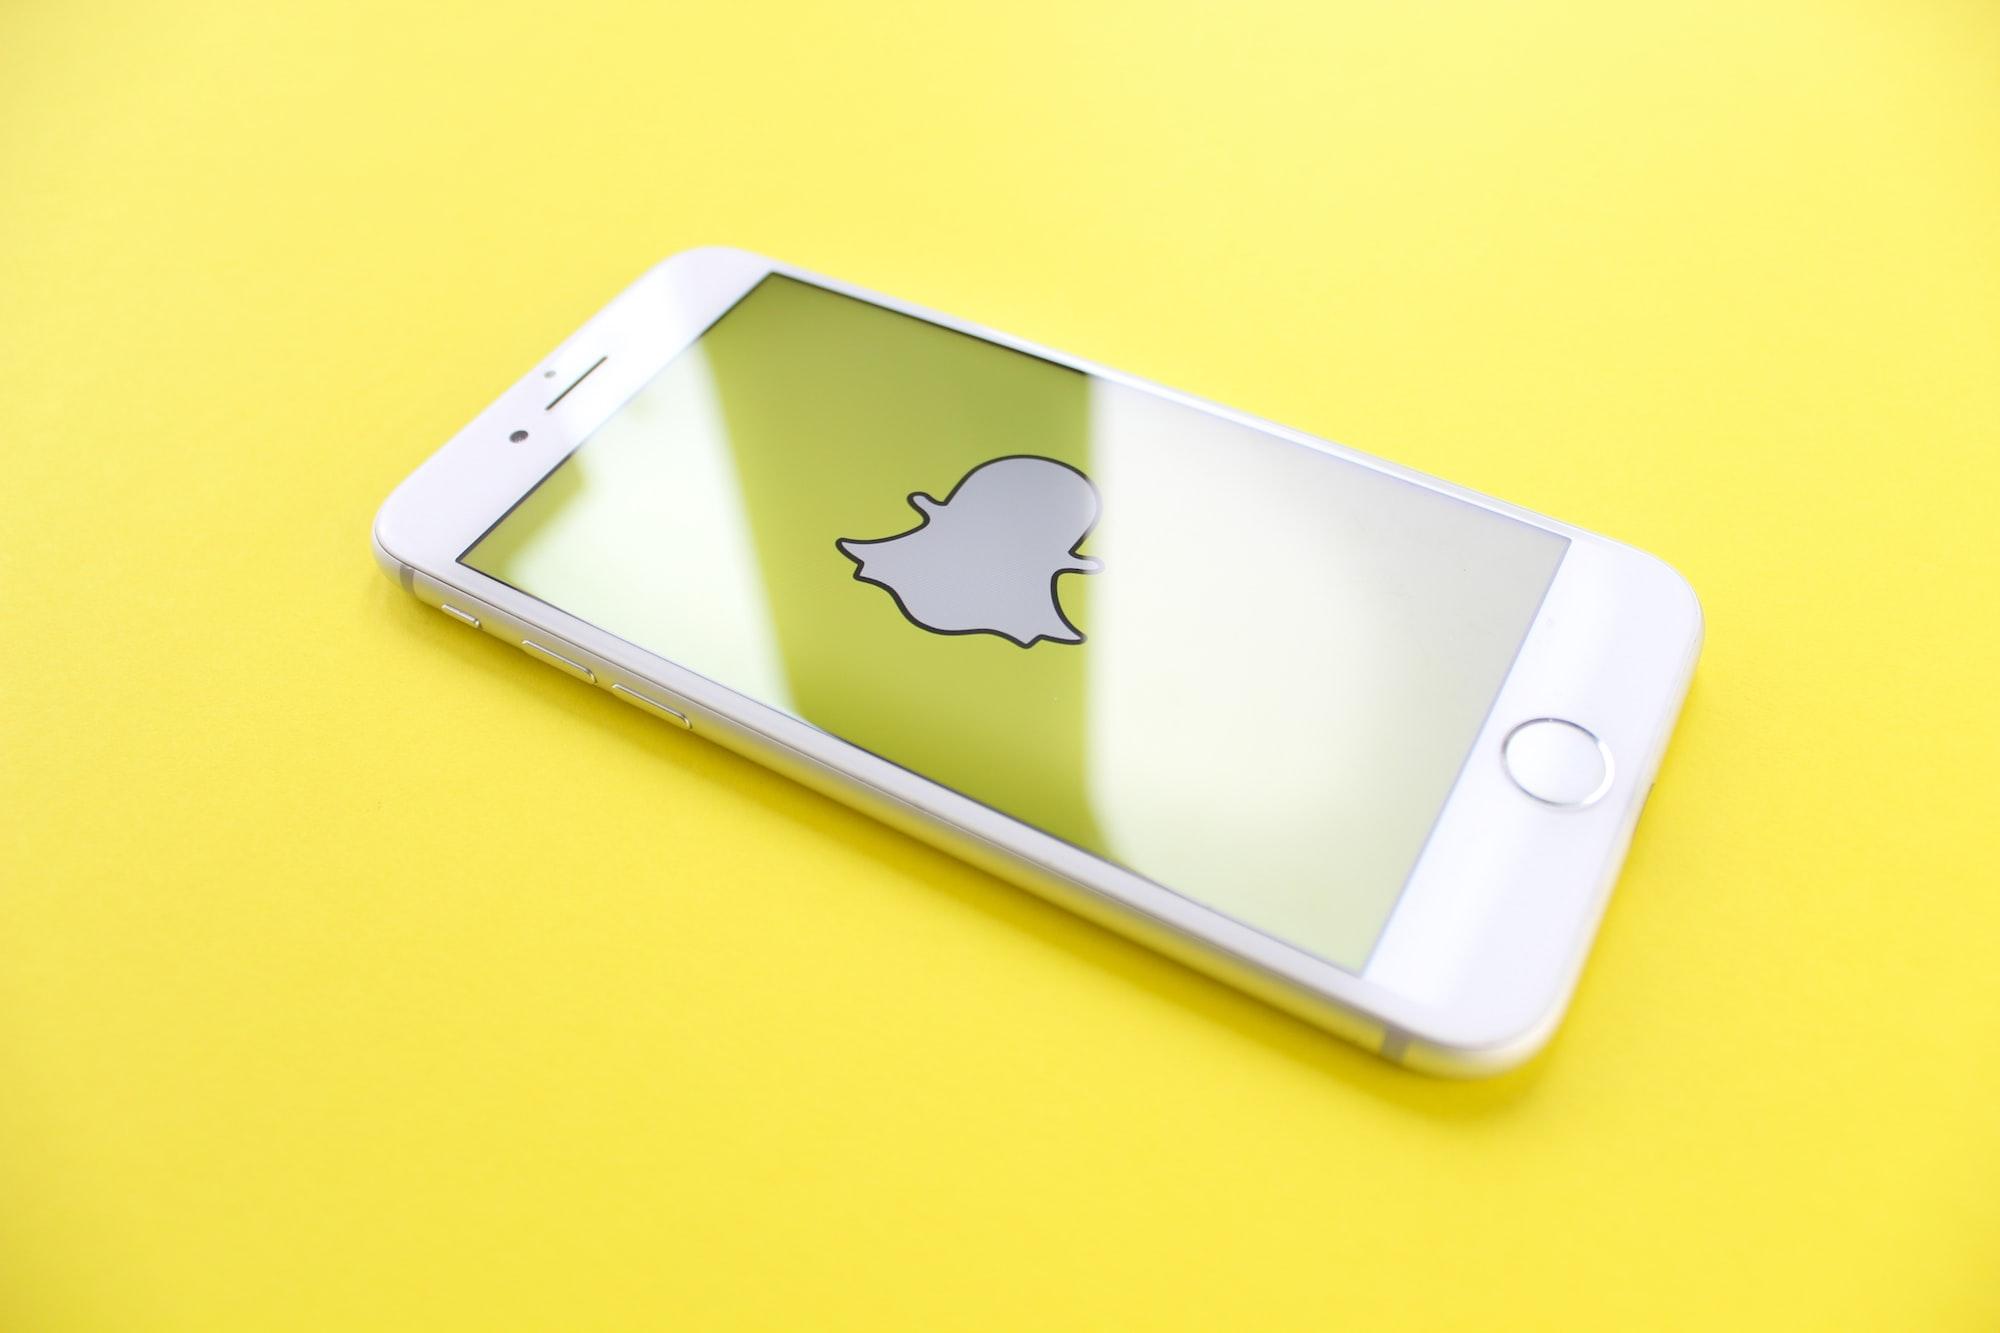 Snapchat - A False Sense Of Security?